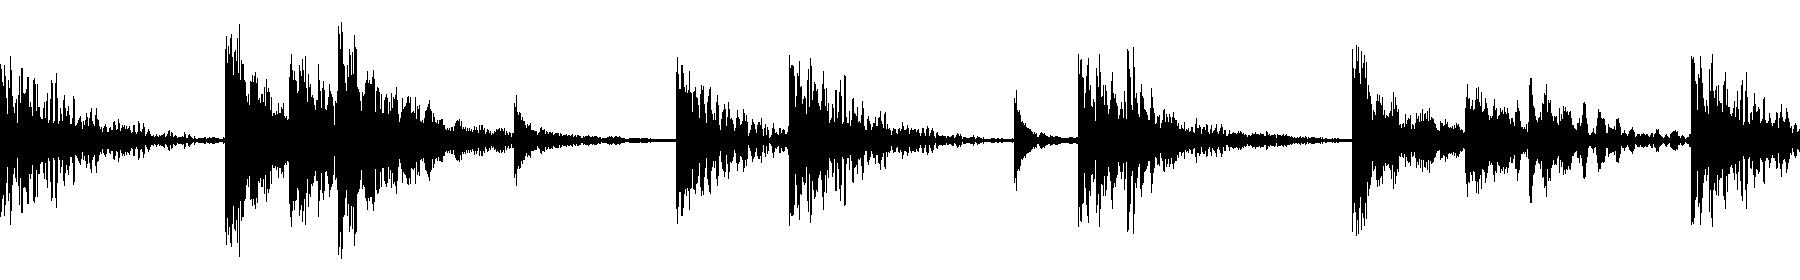 g abs05 092